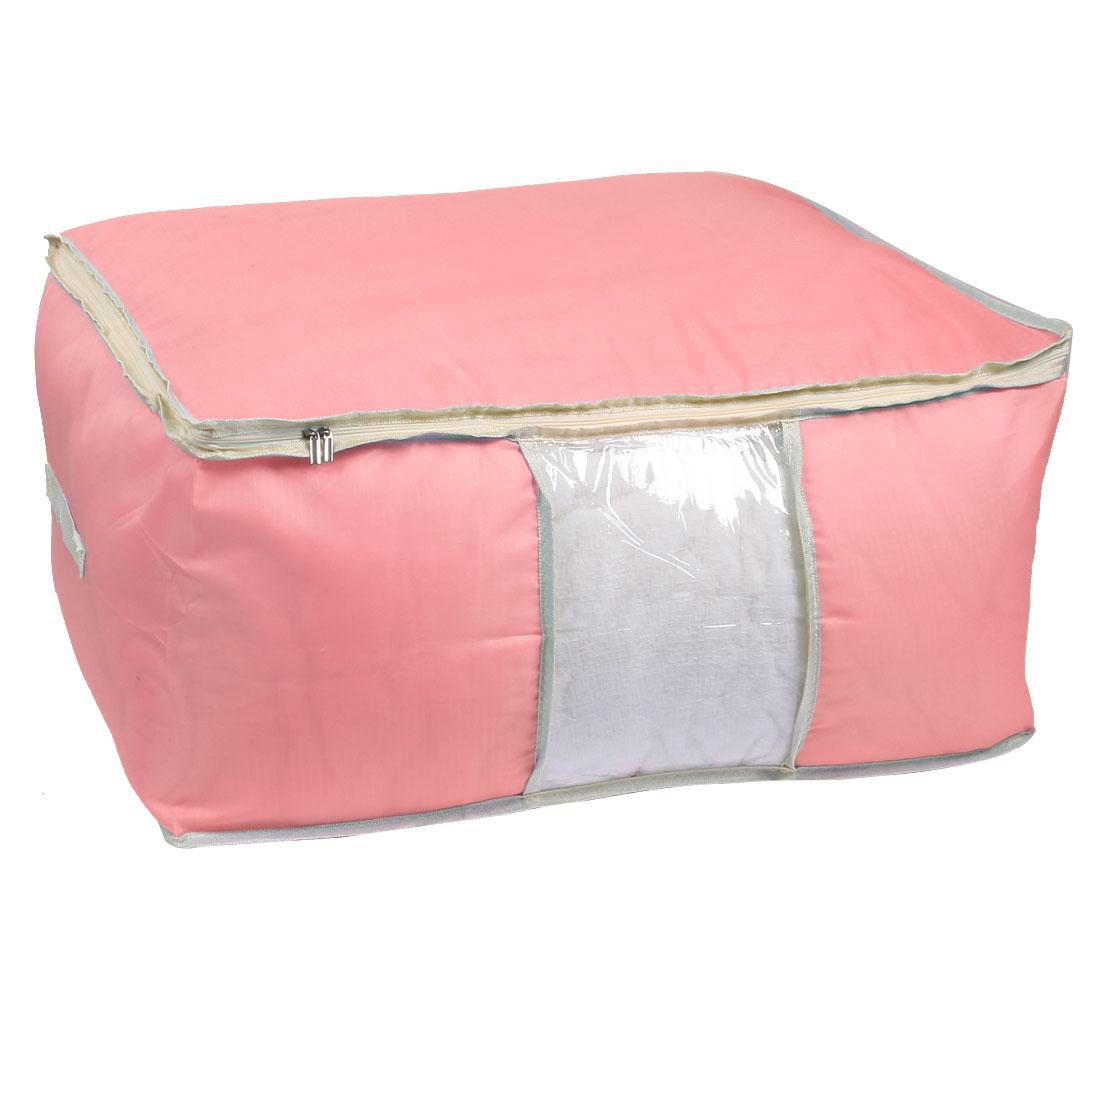 Home Zippered Clothes Coats Sheet Quilt Duvet Storage Bag Pouch Pink 55cm x 35cm